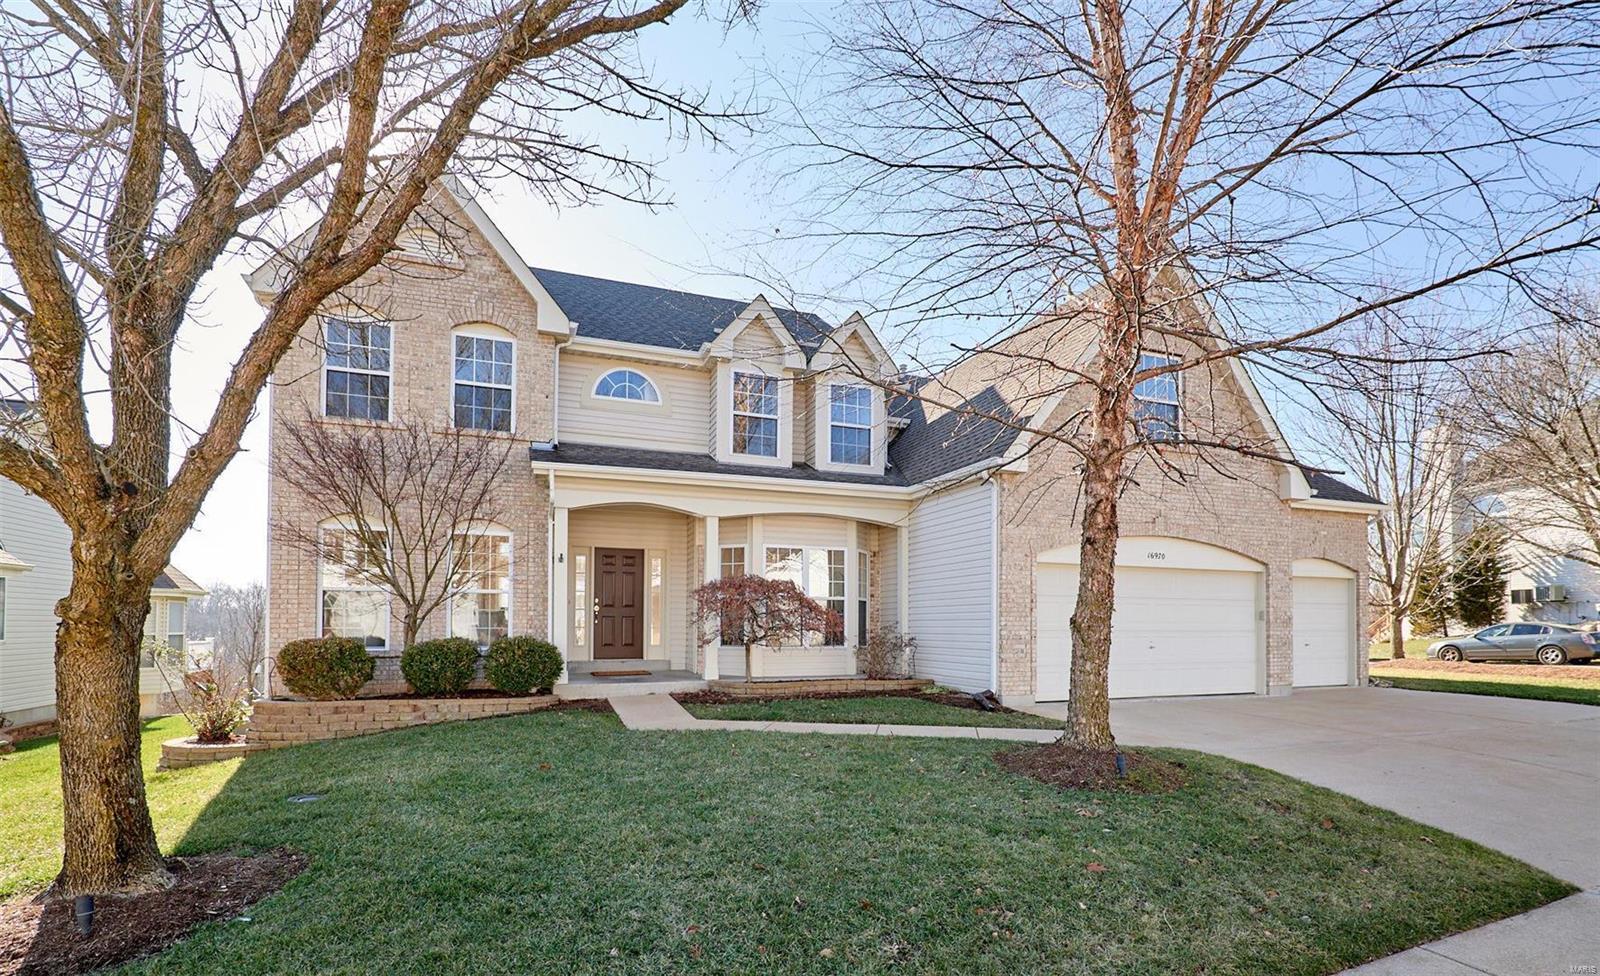 16970 Westridge Oaks Property Photo - Wildwood, MO real estate listing